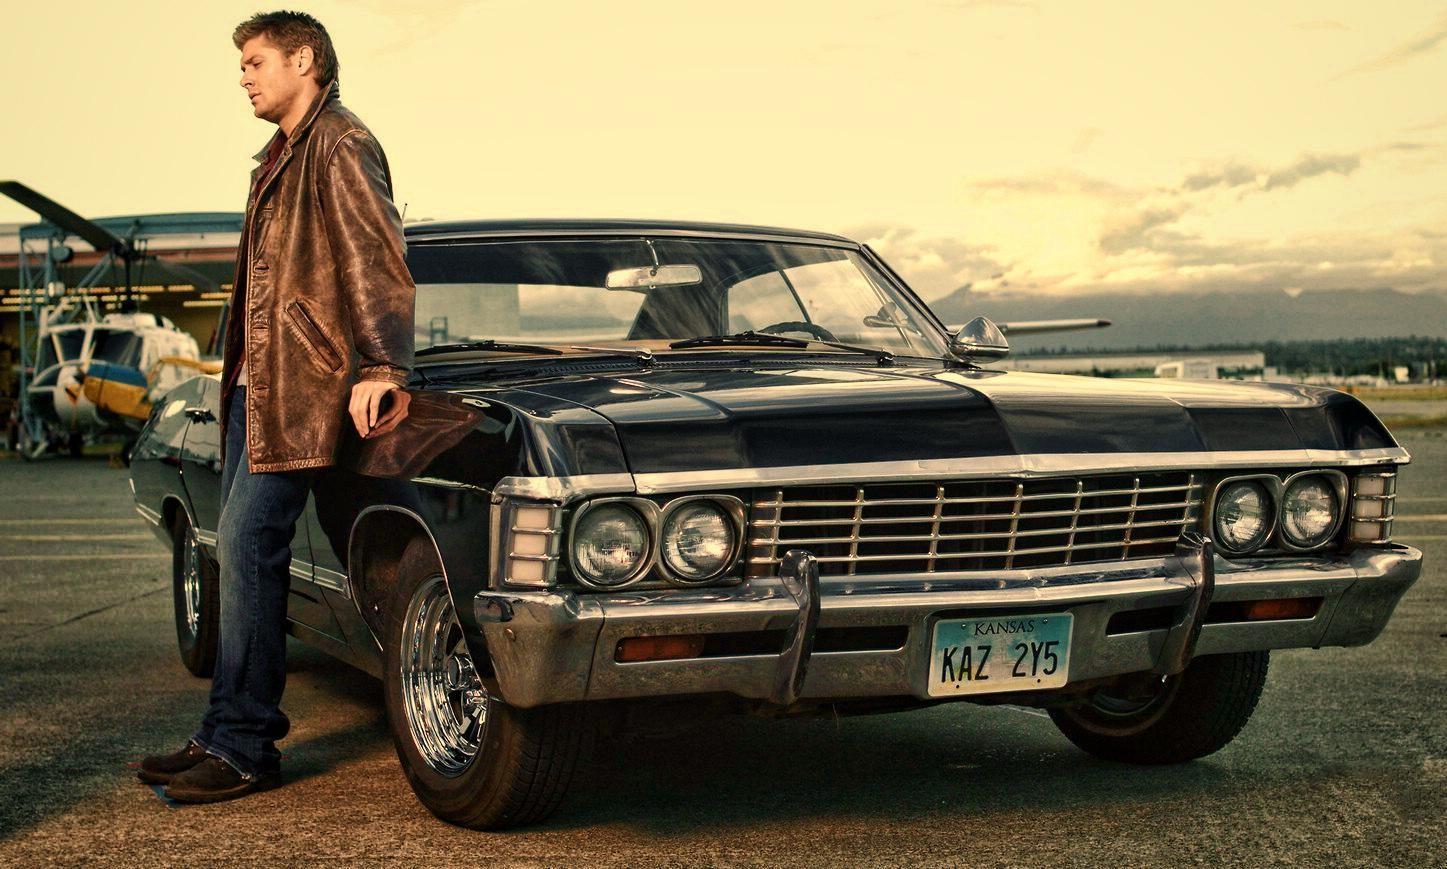 Dean Winchester And His Impala Antilop Chevrolet Impala Dogaustu